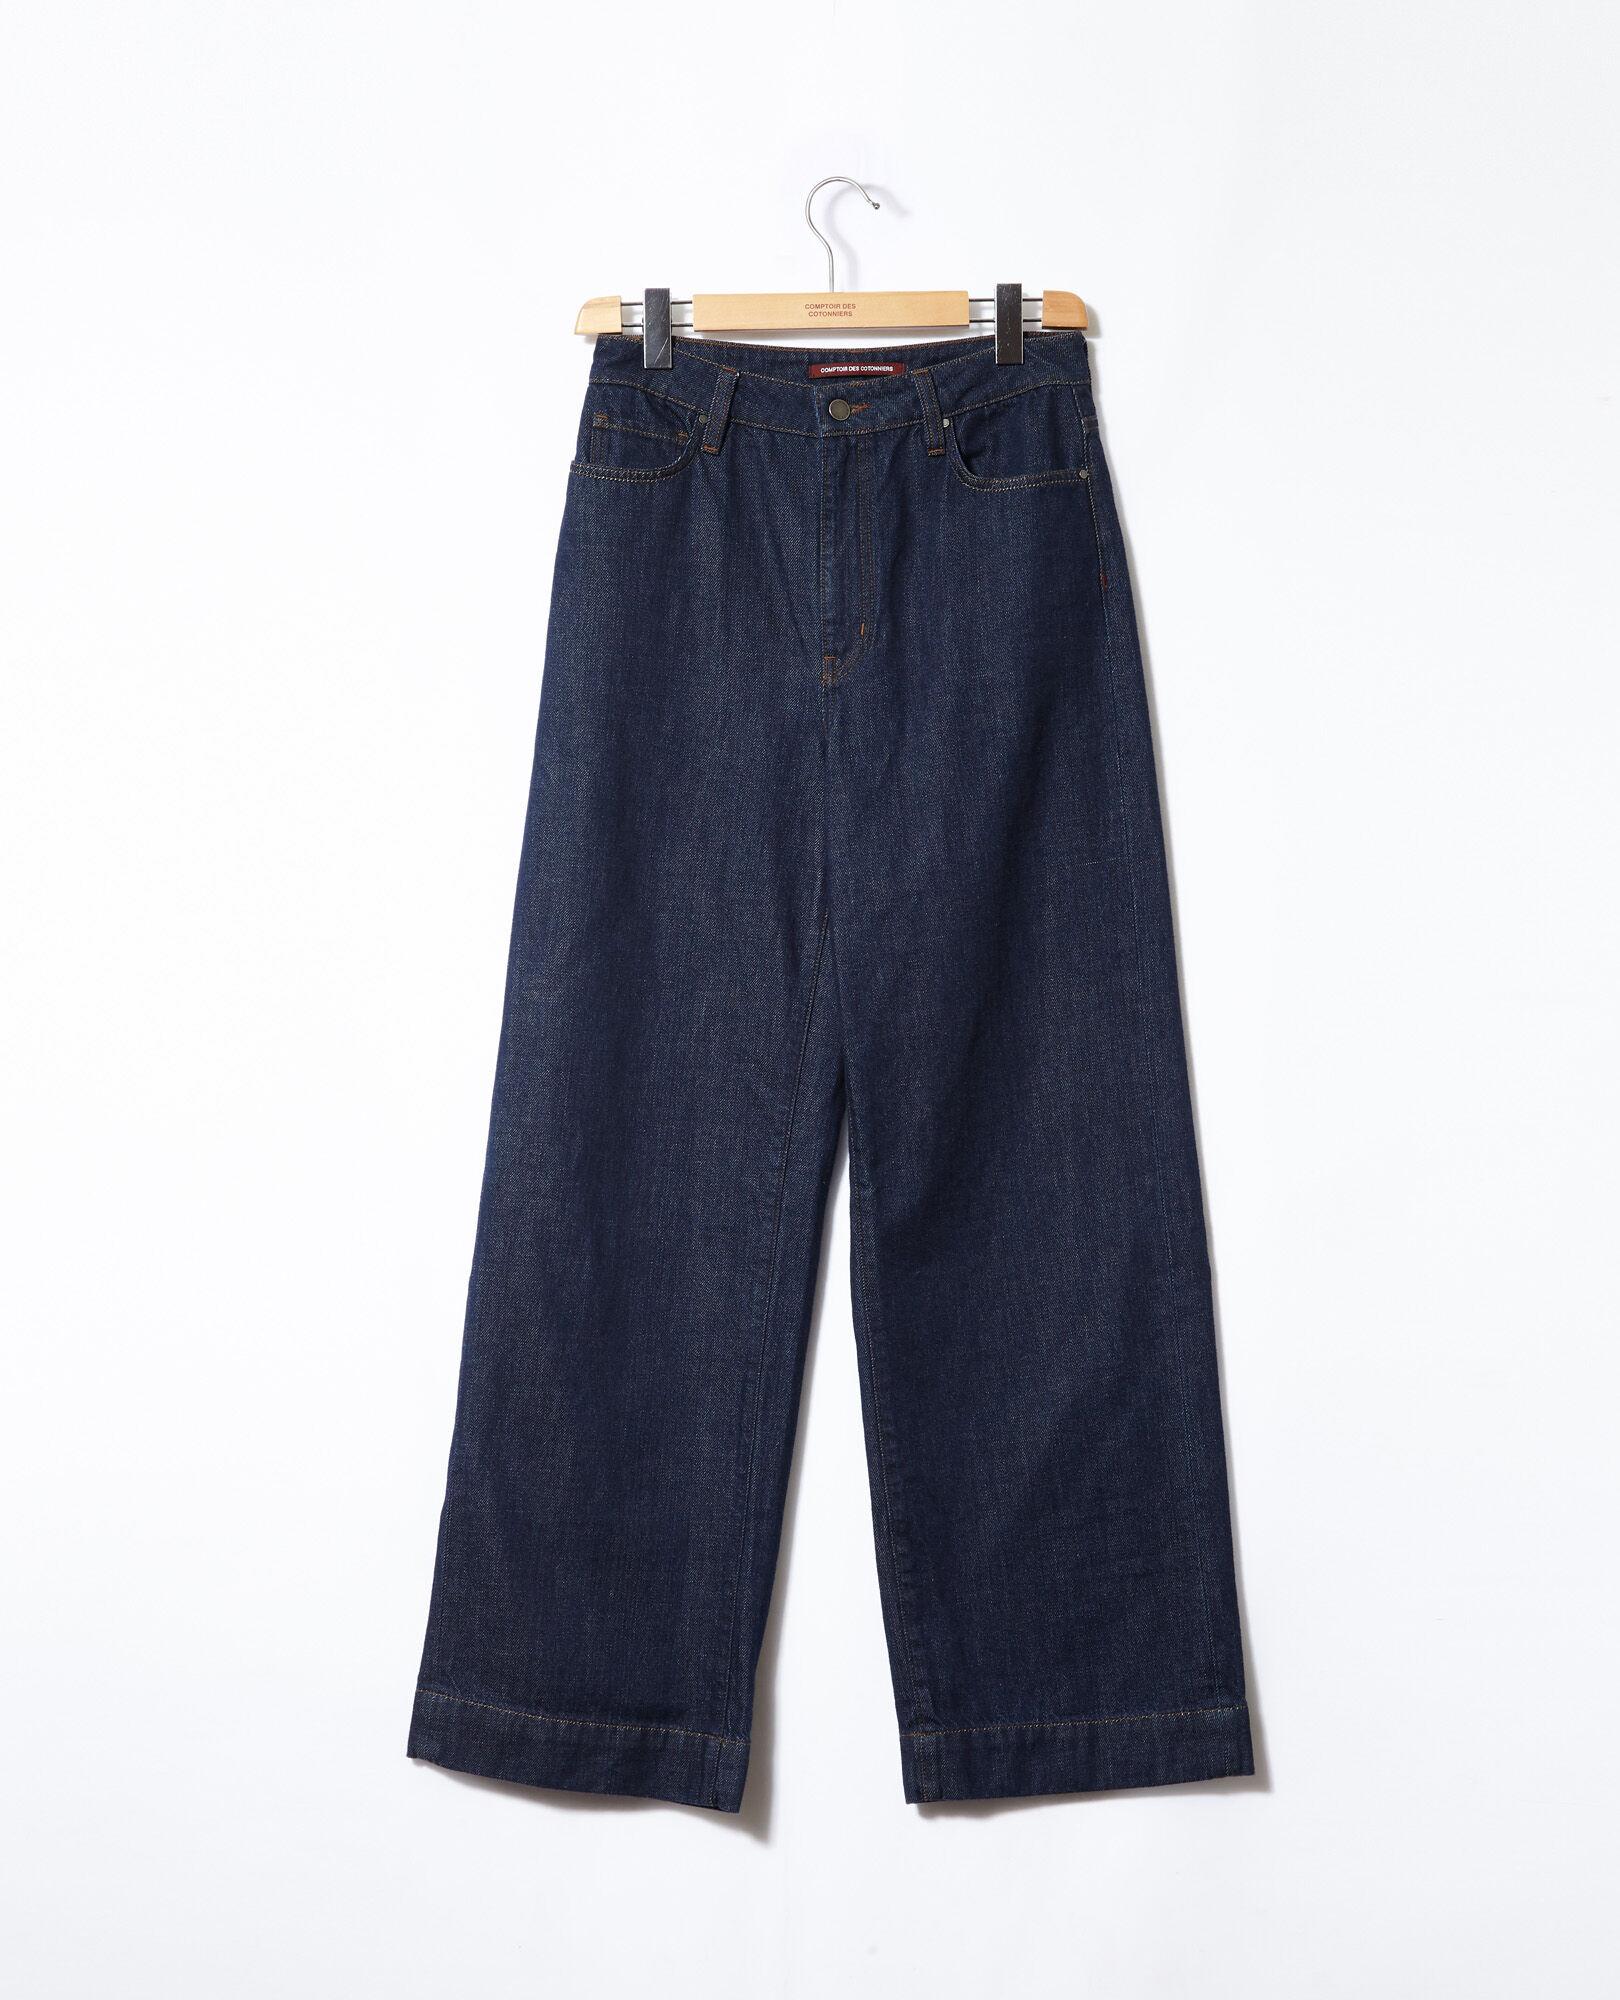 Des Jeans Glin Rinse Length Comptoir Full Femme Wide Couleur axZqPf8a